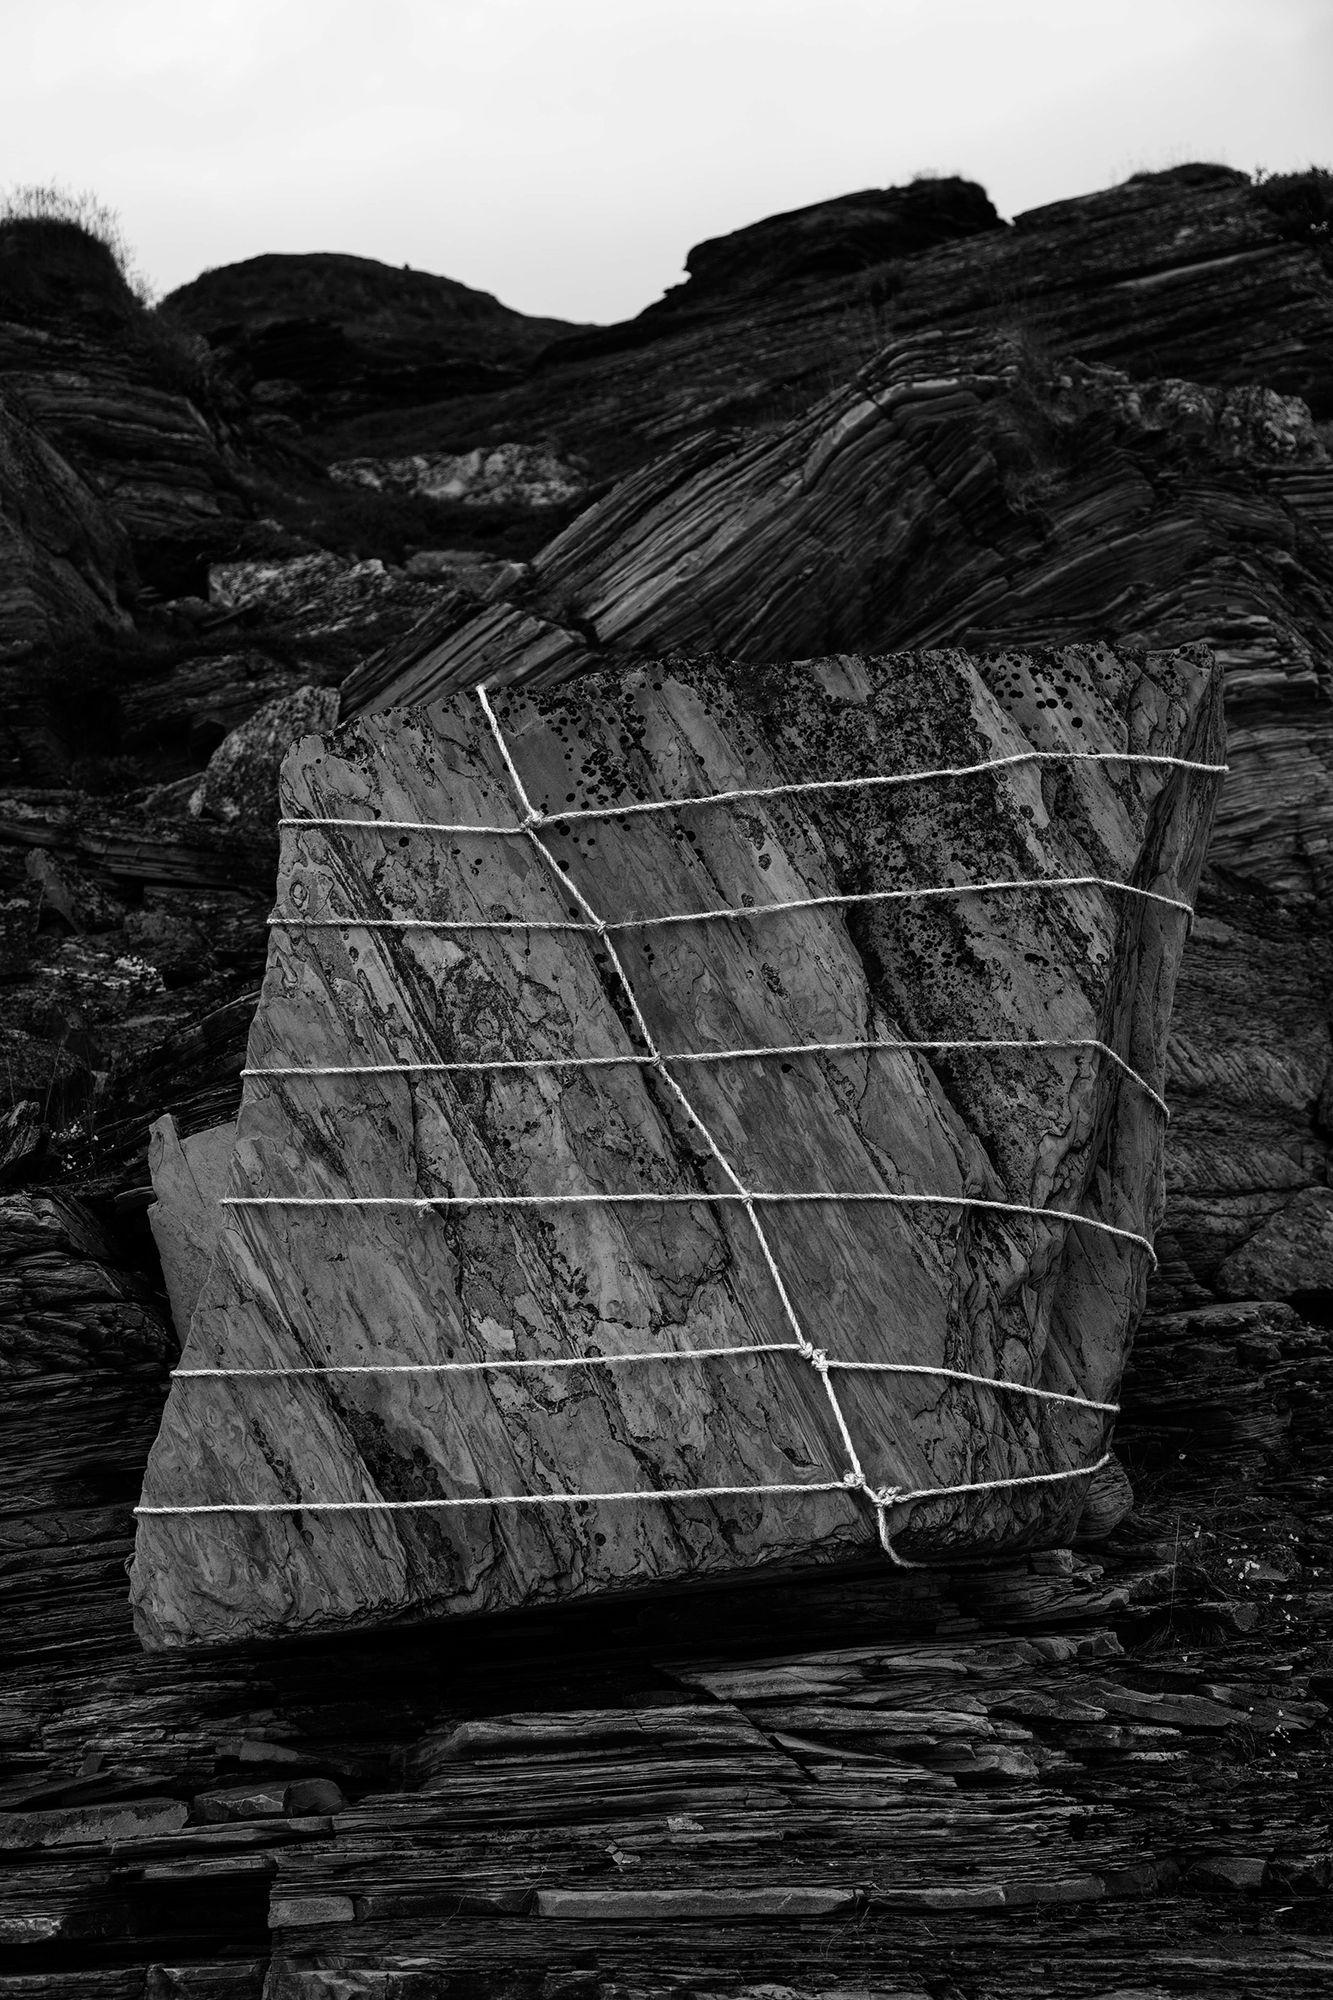 LensCulture - Contemporary Photography